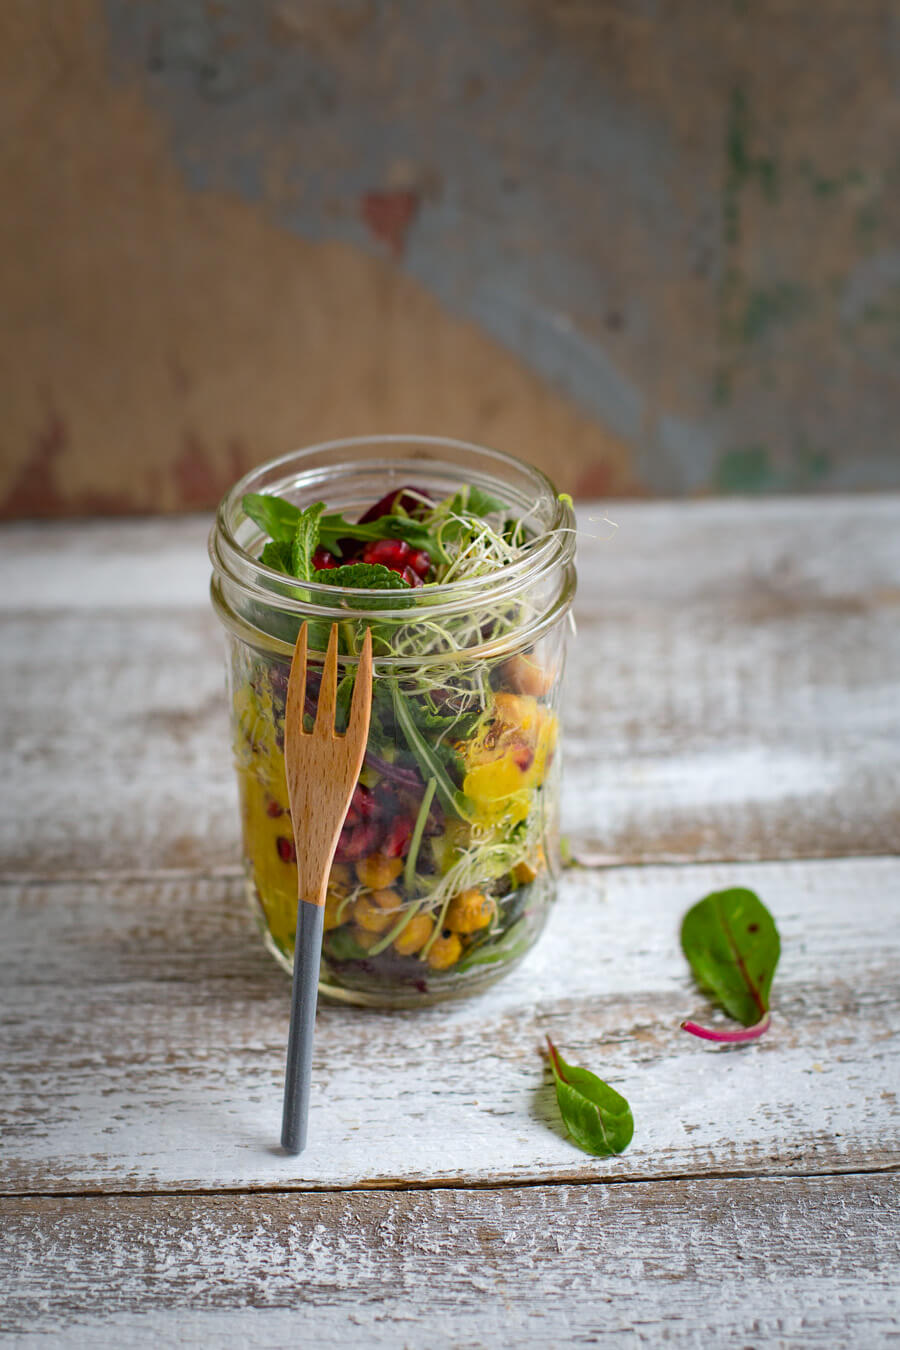 Wild herbs salad in a glas